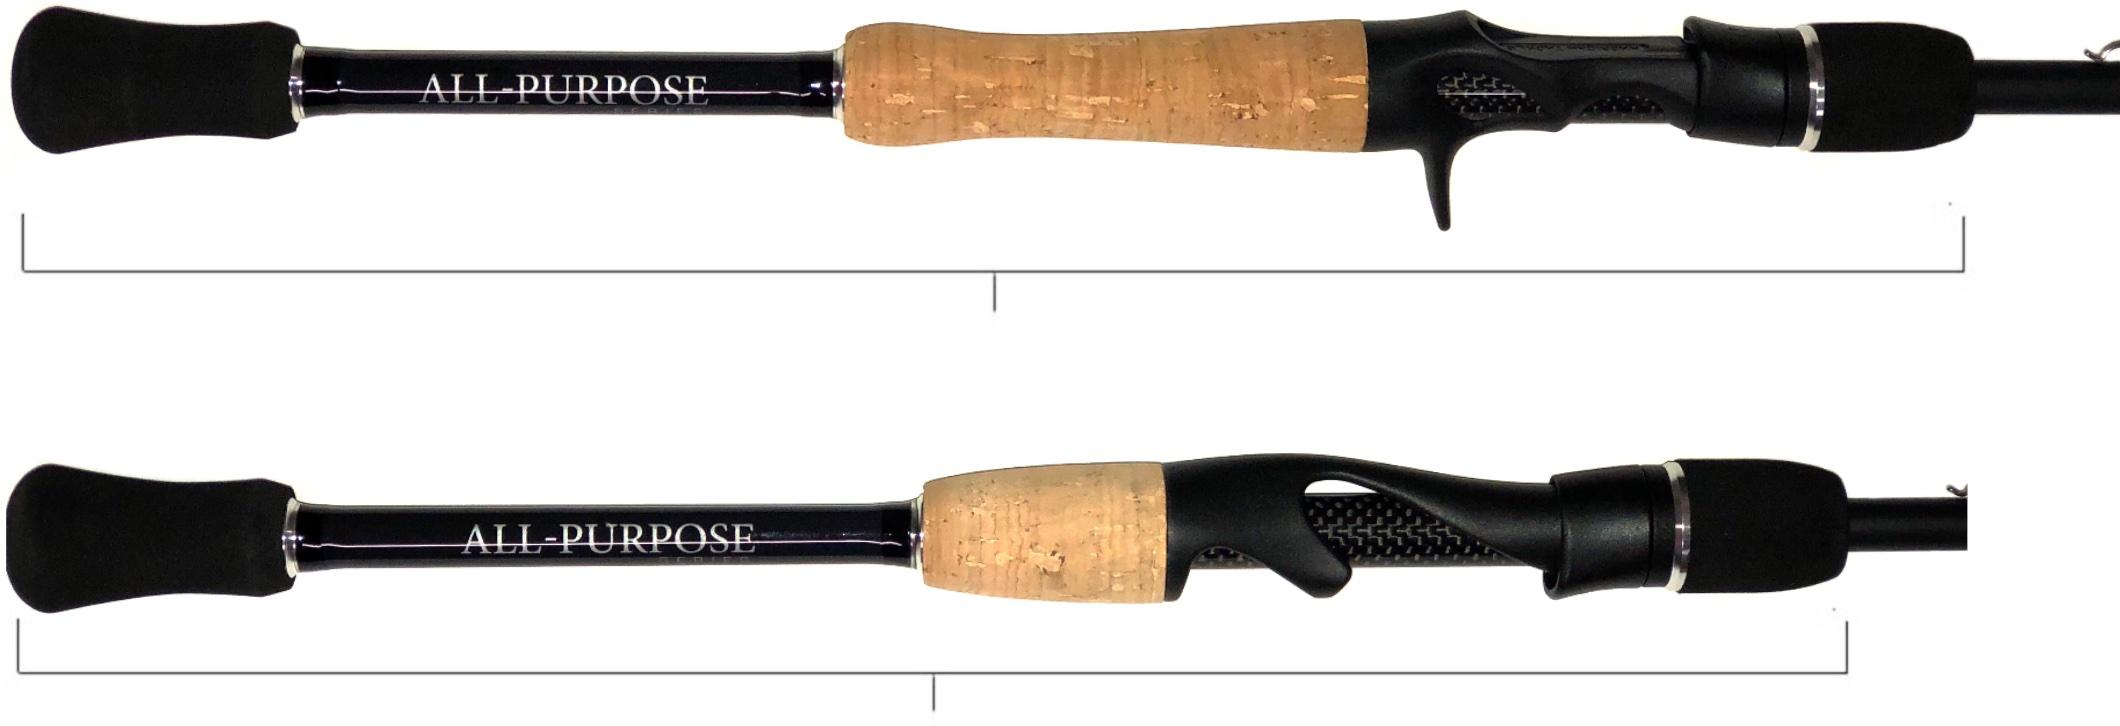 allpurpose-casting-spinning-handle.jpg